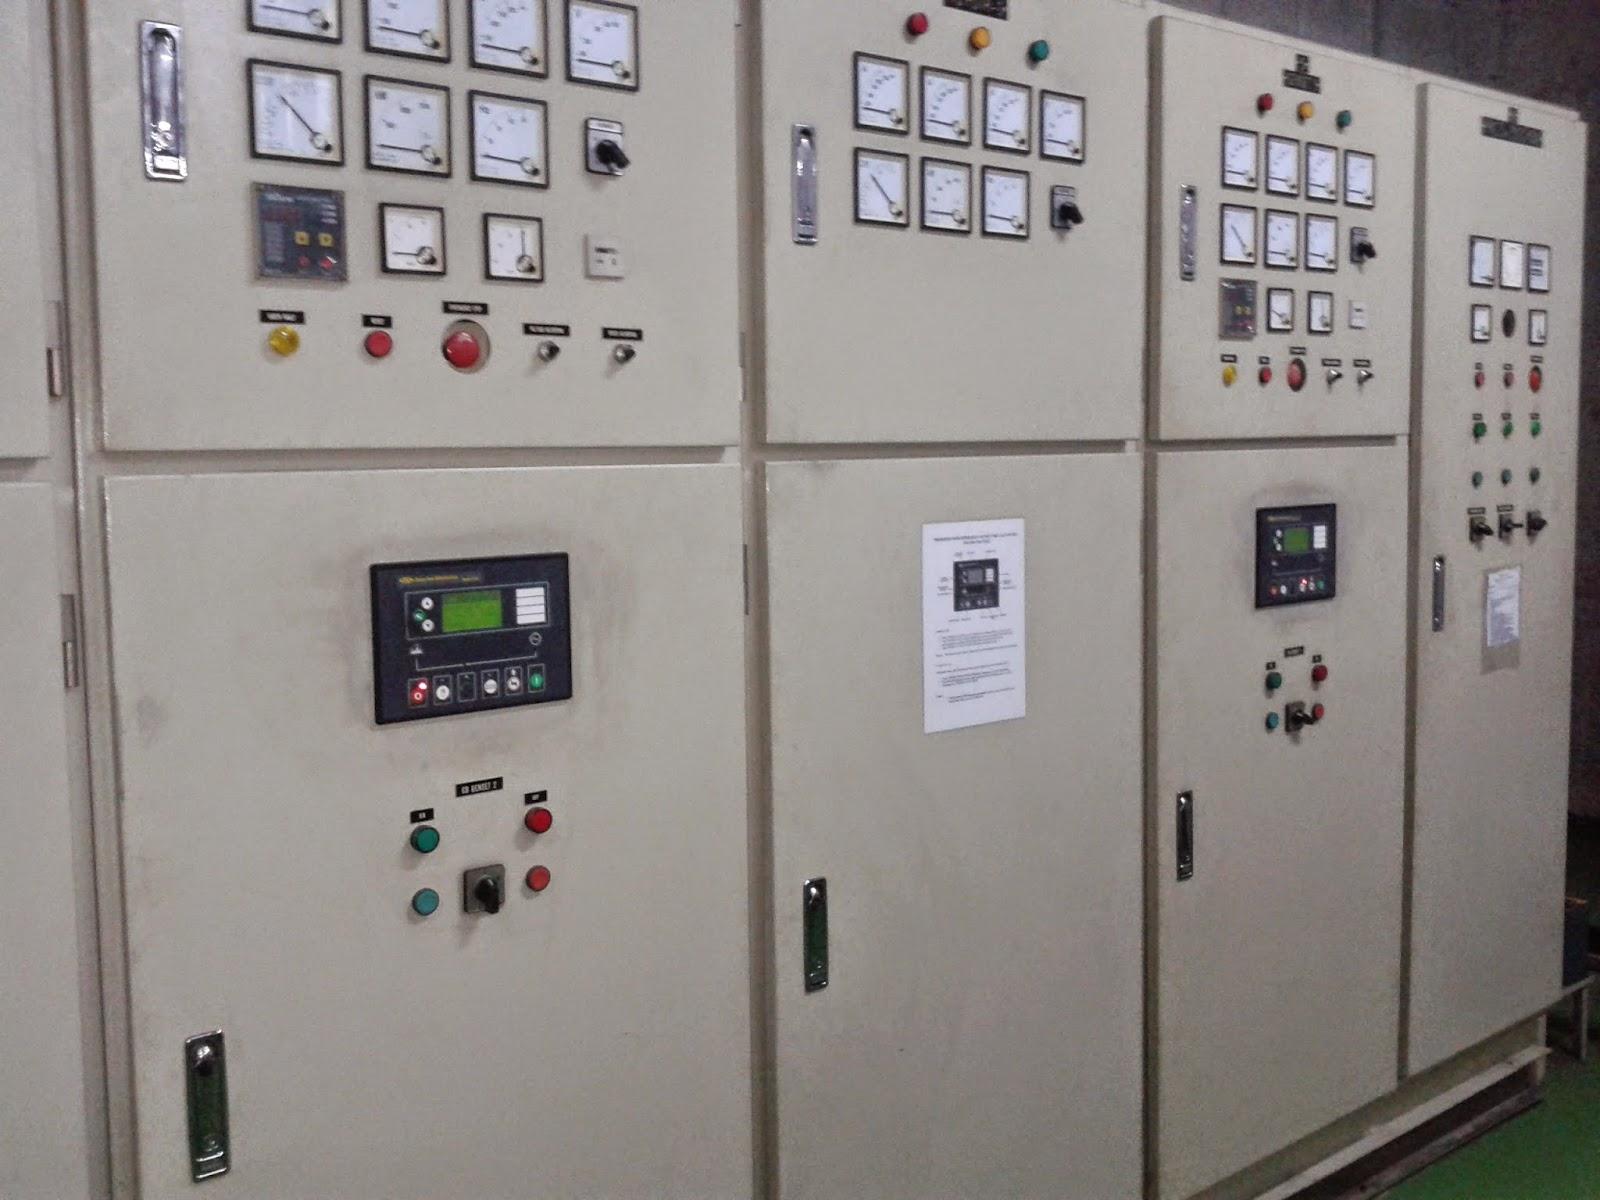 melayani jasa pmbuatan dan service panel singkron genset